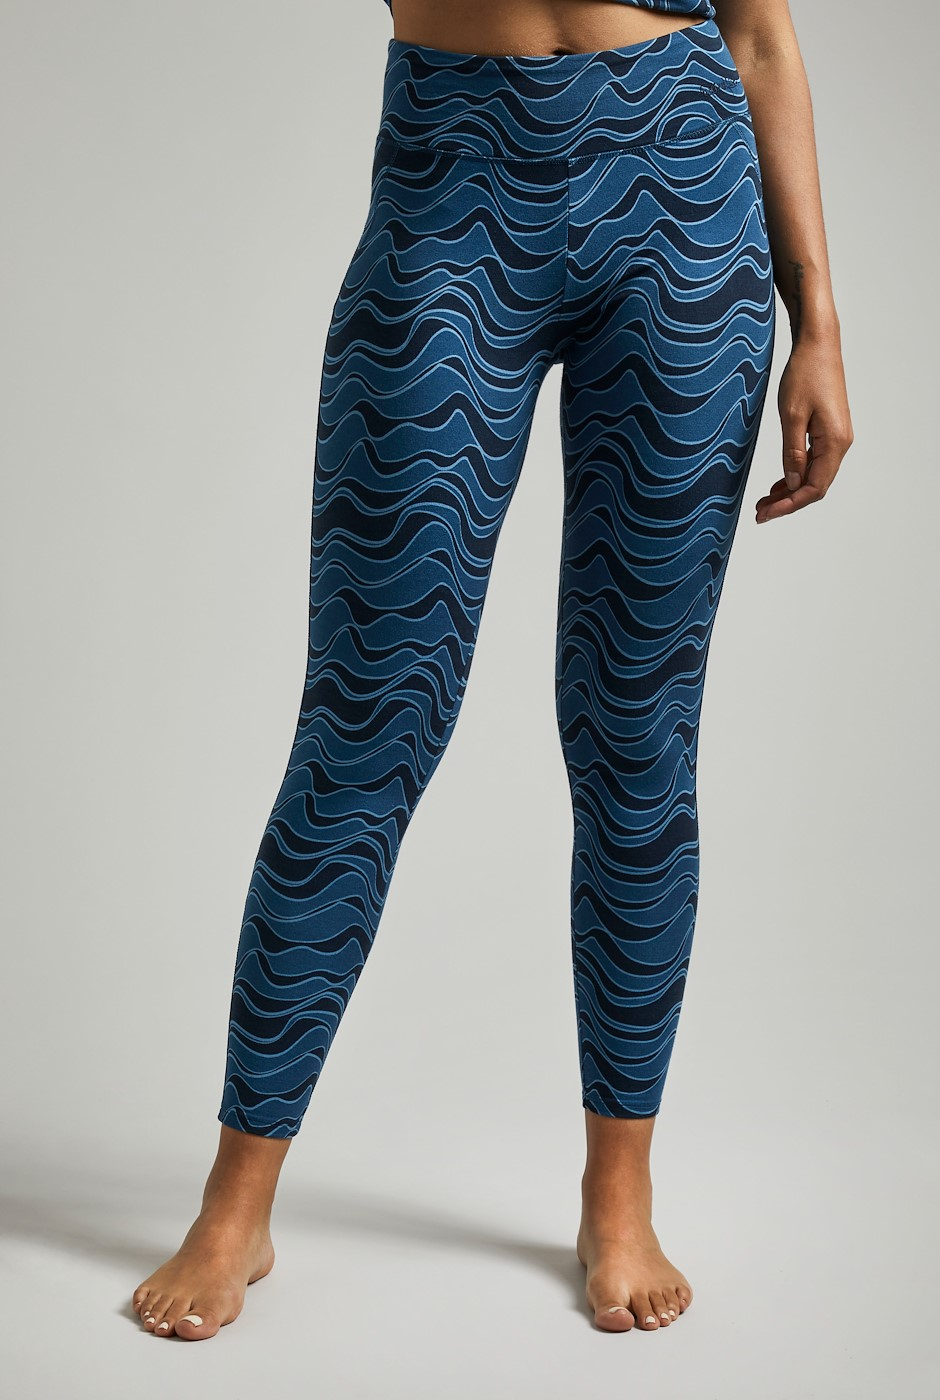 Tamra Bamboo Yoga Leggings Ensign Blue